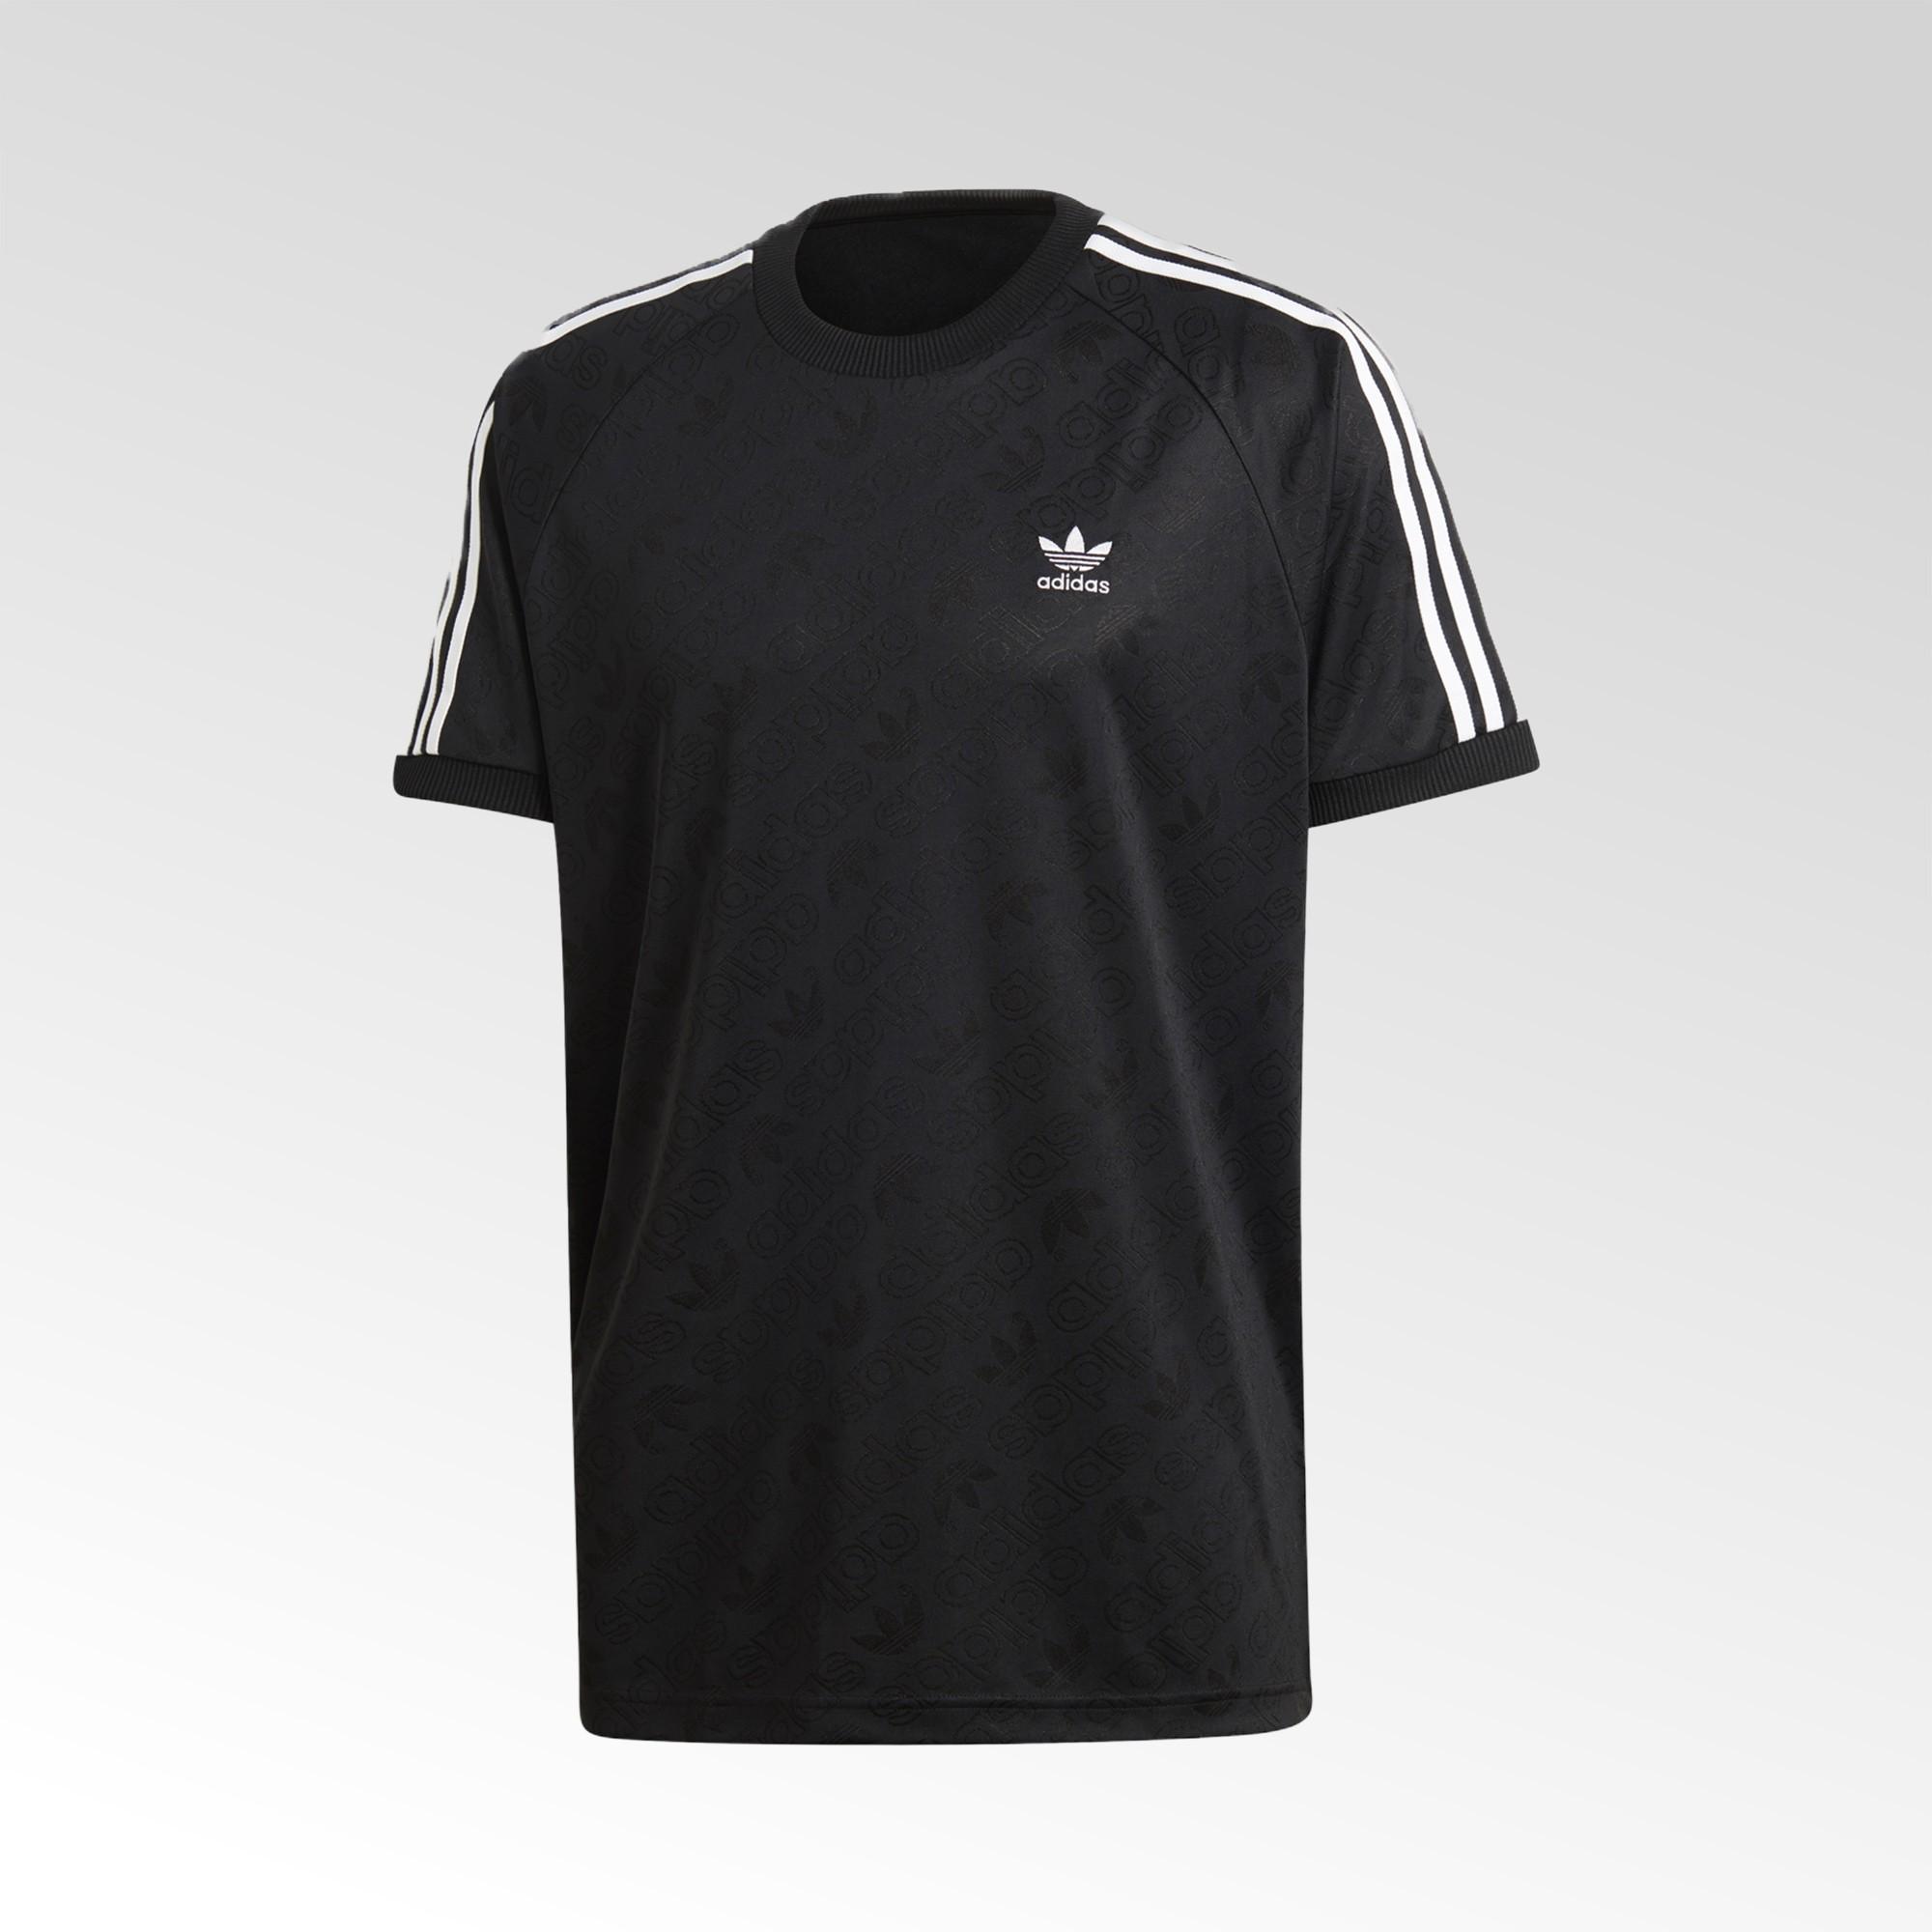 Koszulka męska Adidas Monogram Jersey - ED7038 - 1